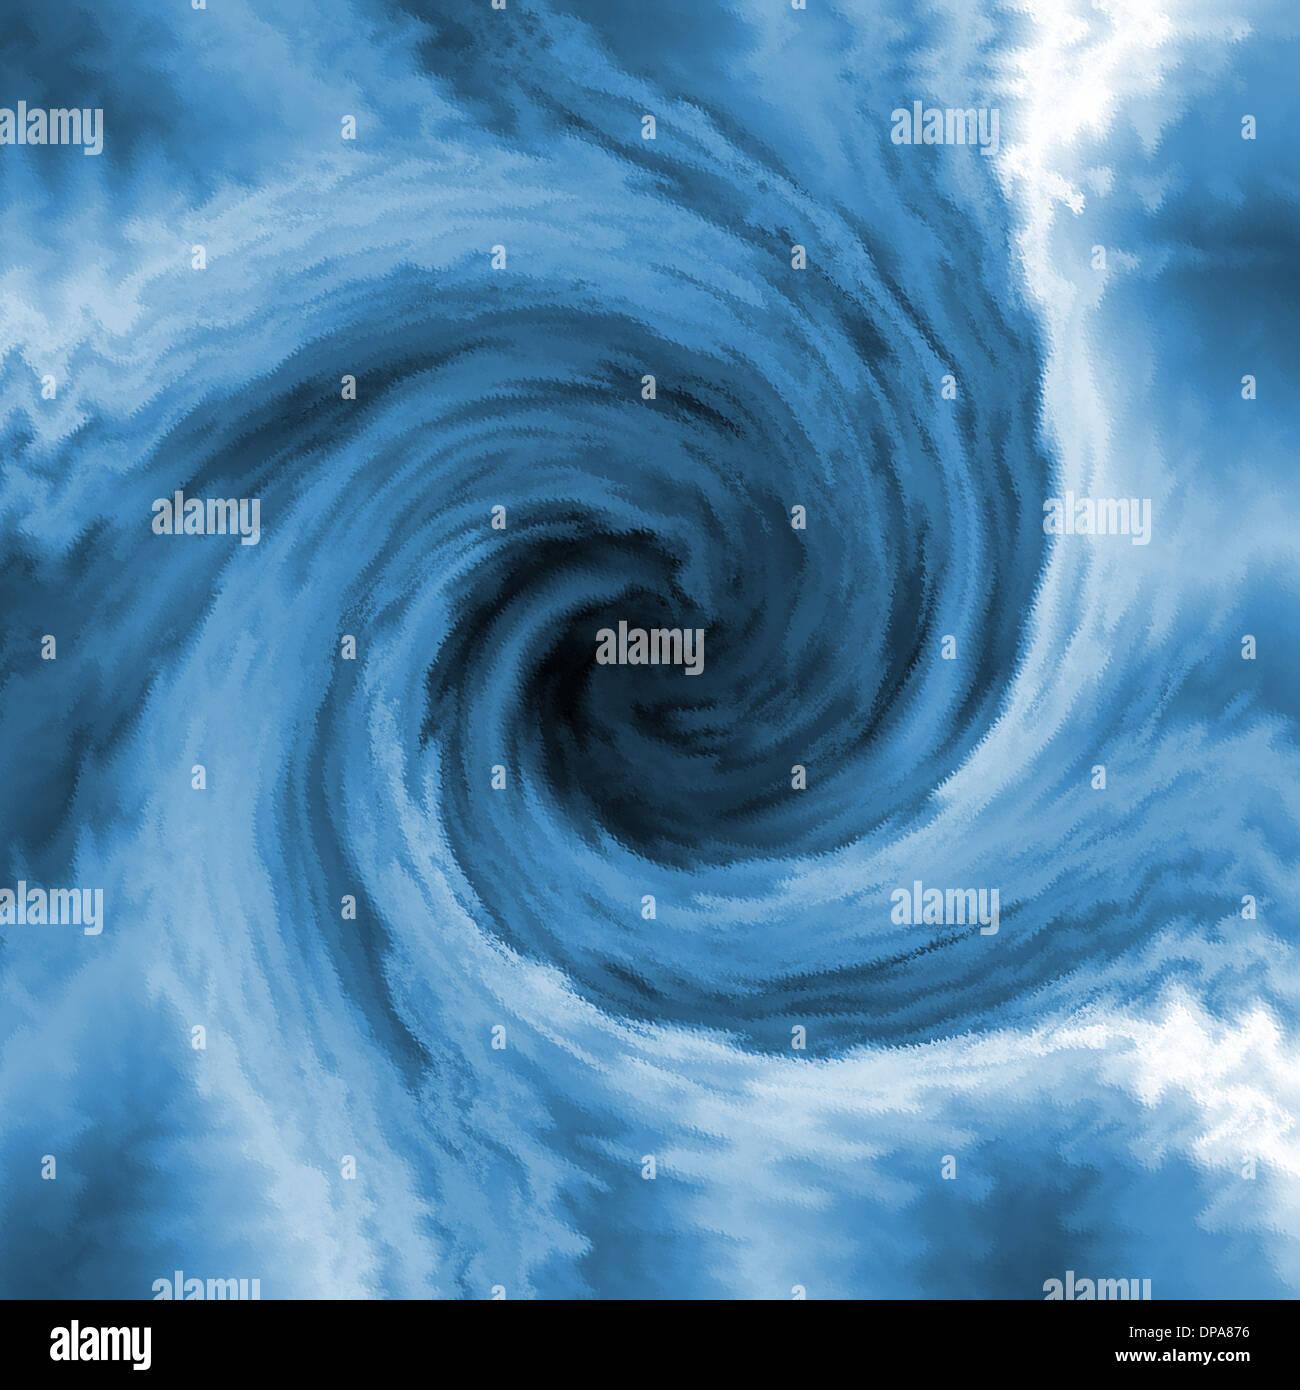 Blue Abstract Swirl Tornado Background Stock Photo